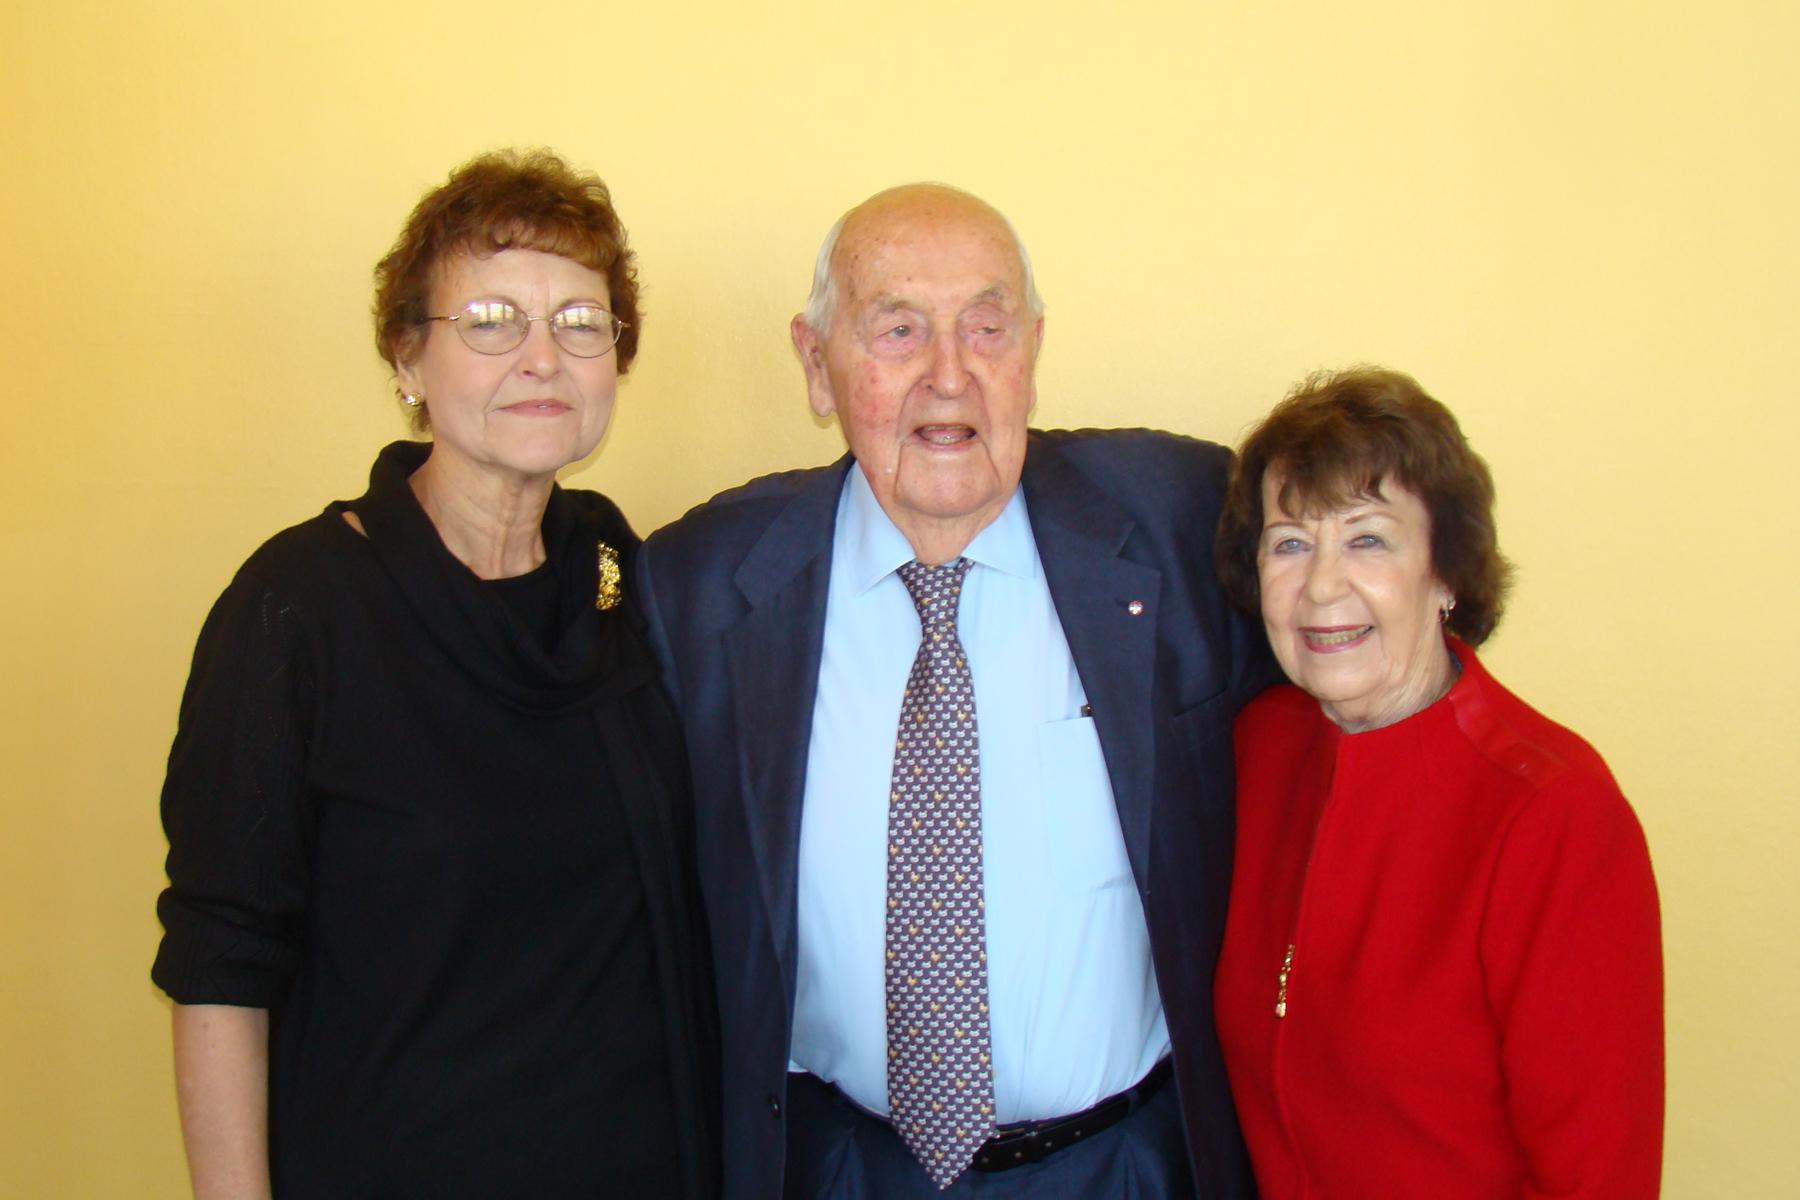 Sir Lennox Hewitt, Kim Michel & Ruth Newton - 1, 30 Oct '08.jpg